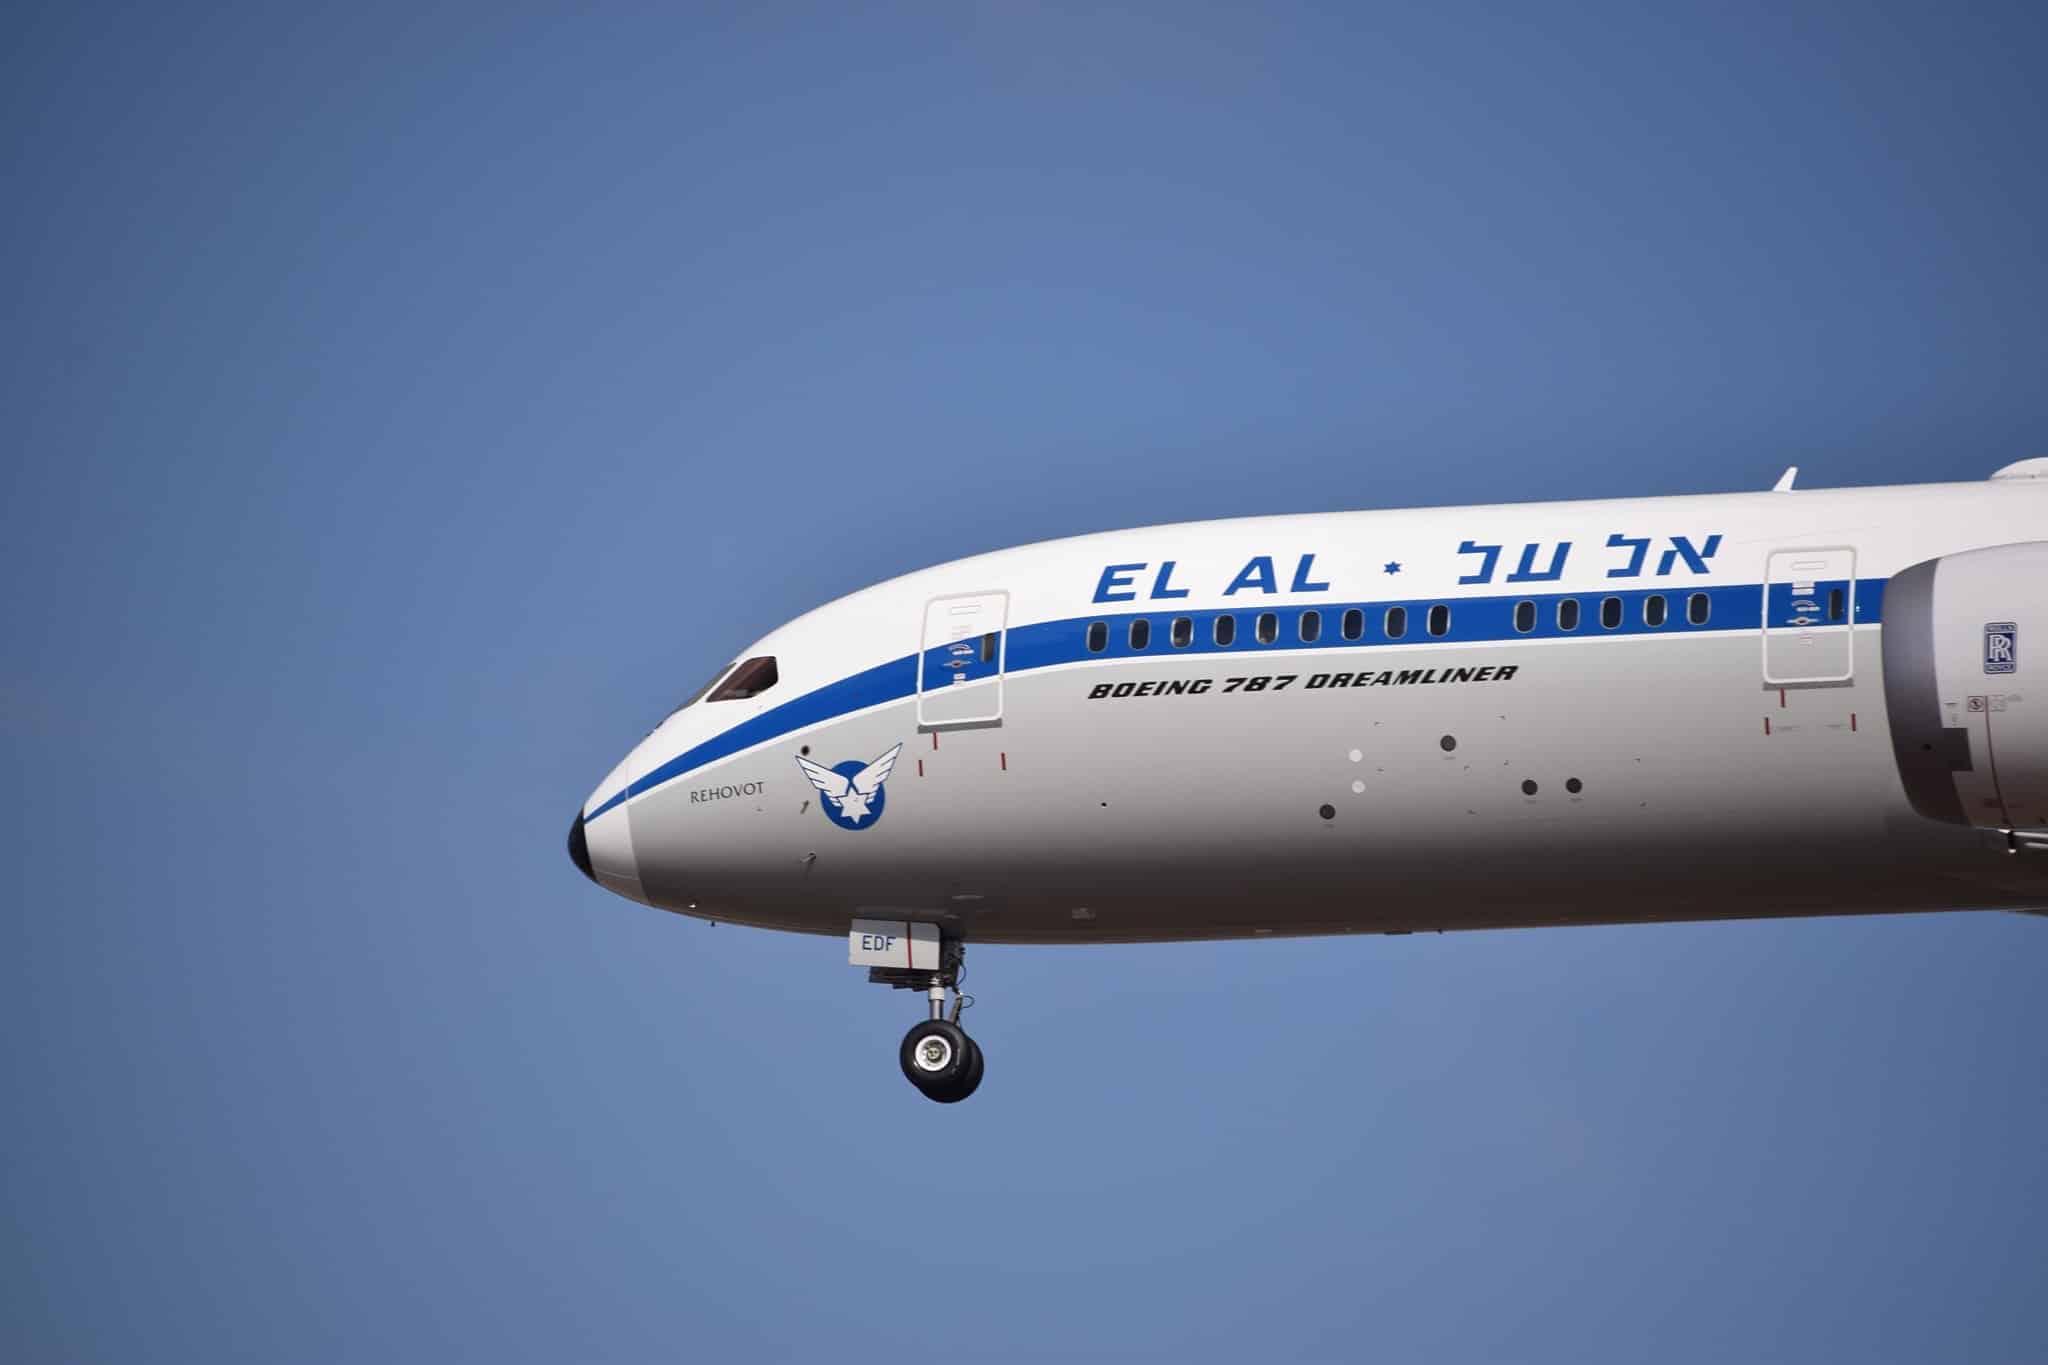 Boeing 787-9-EL-AL-retro-livrea